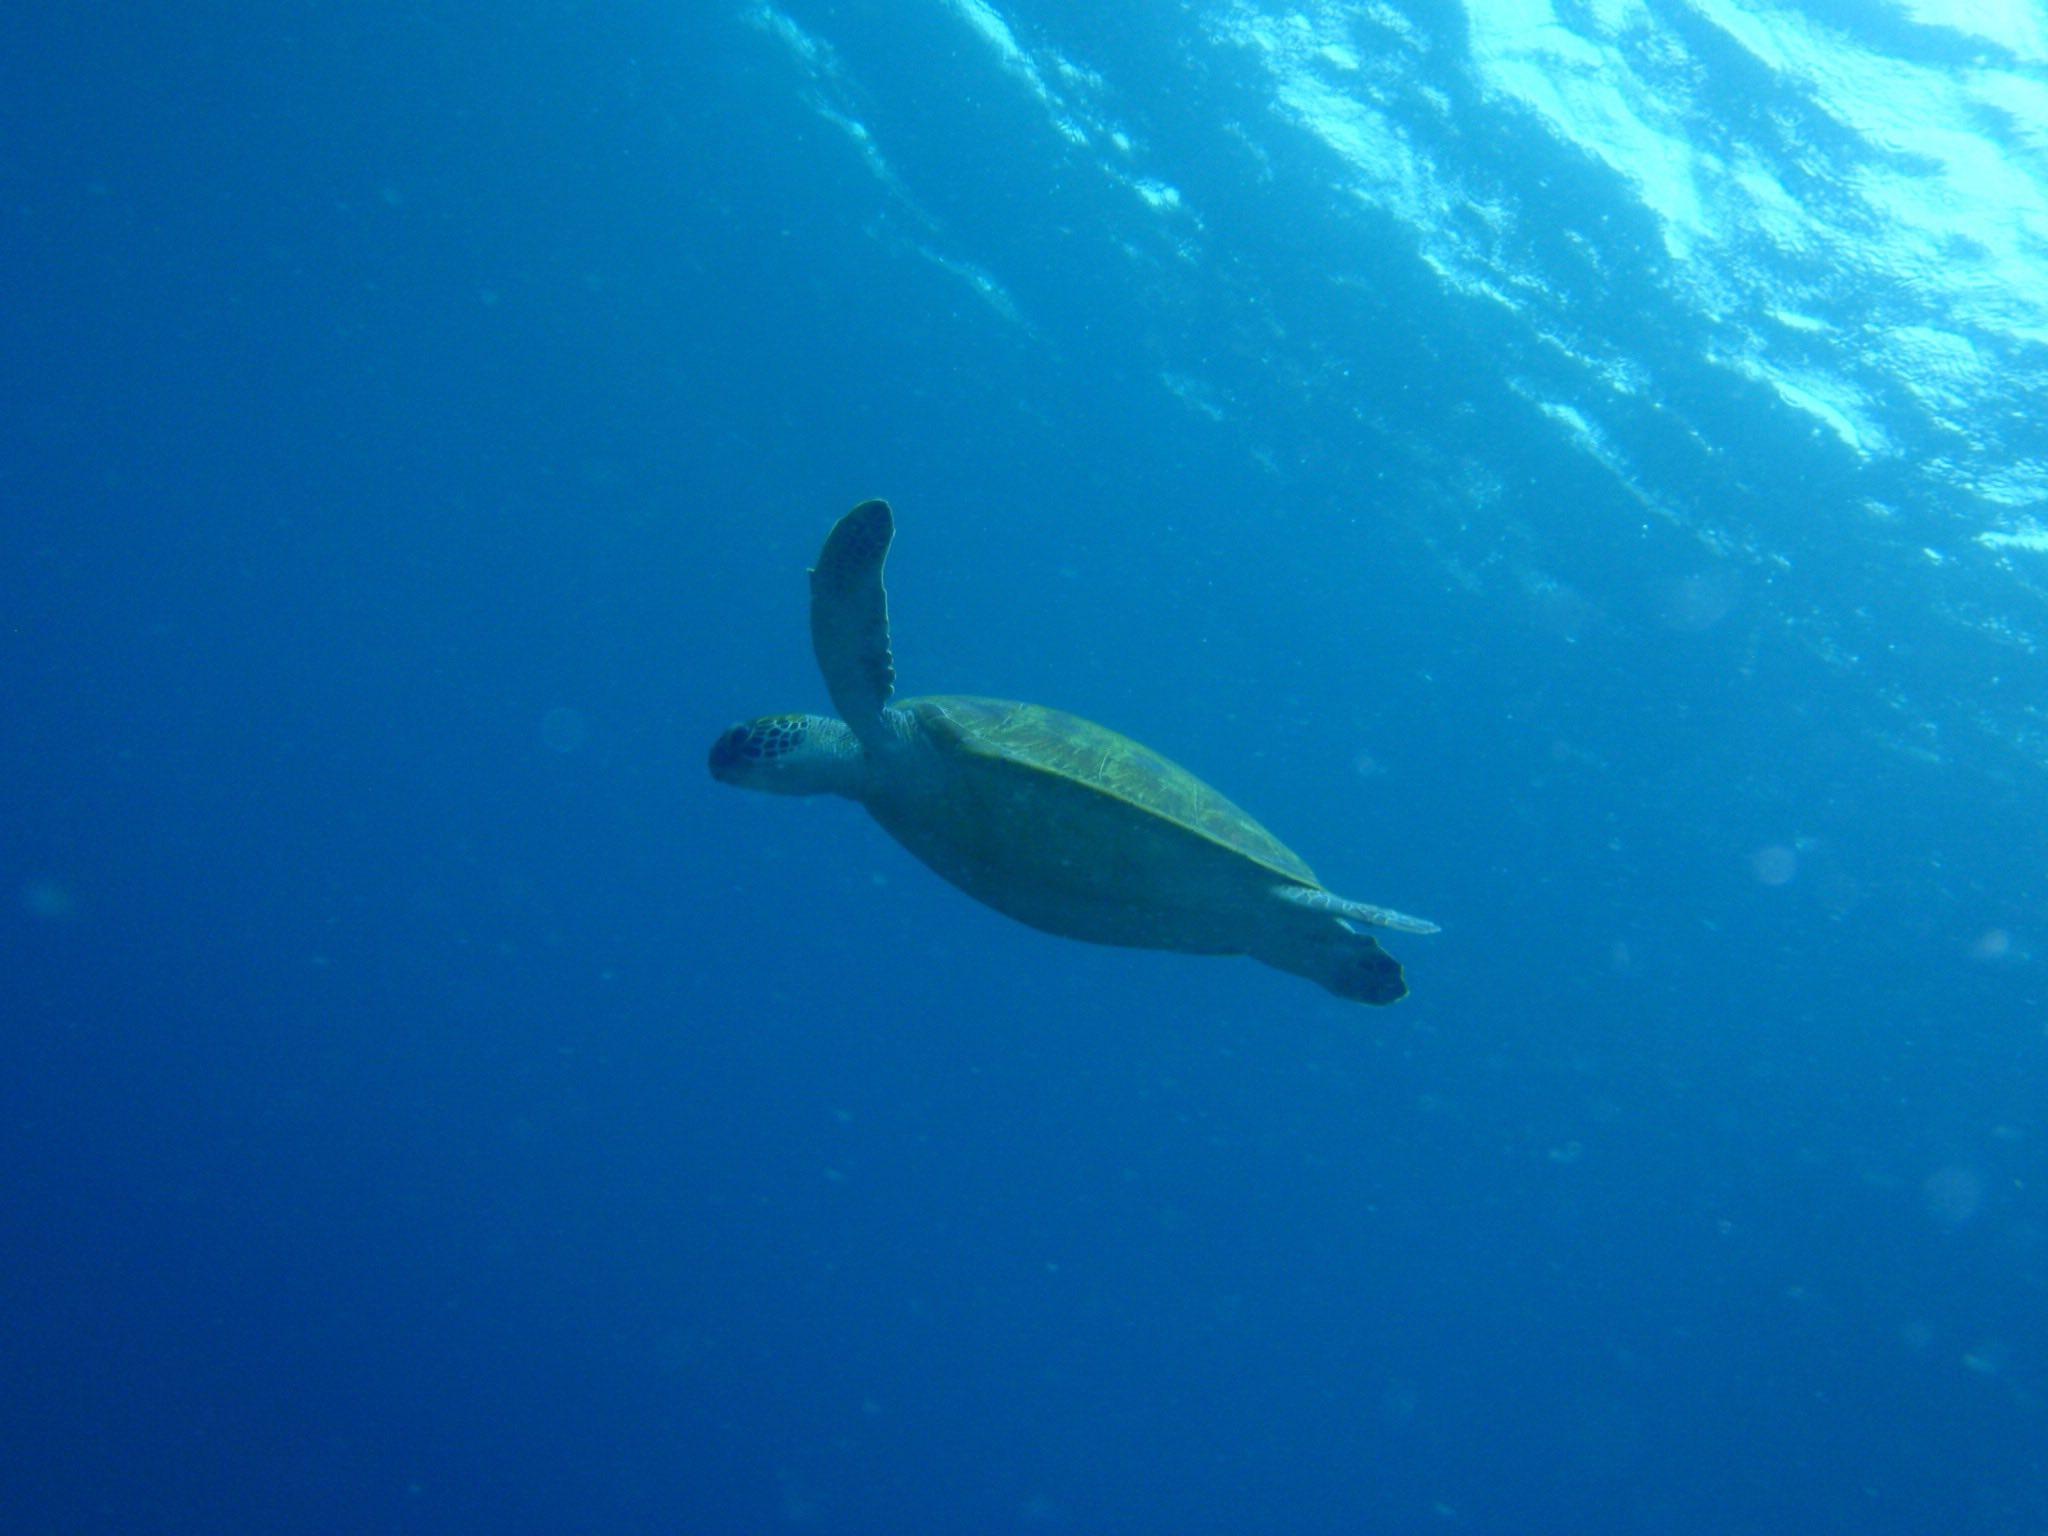 http://www.aquamarine-dive.net/blog/index.html/2015/04/29/P4283226.jpg